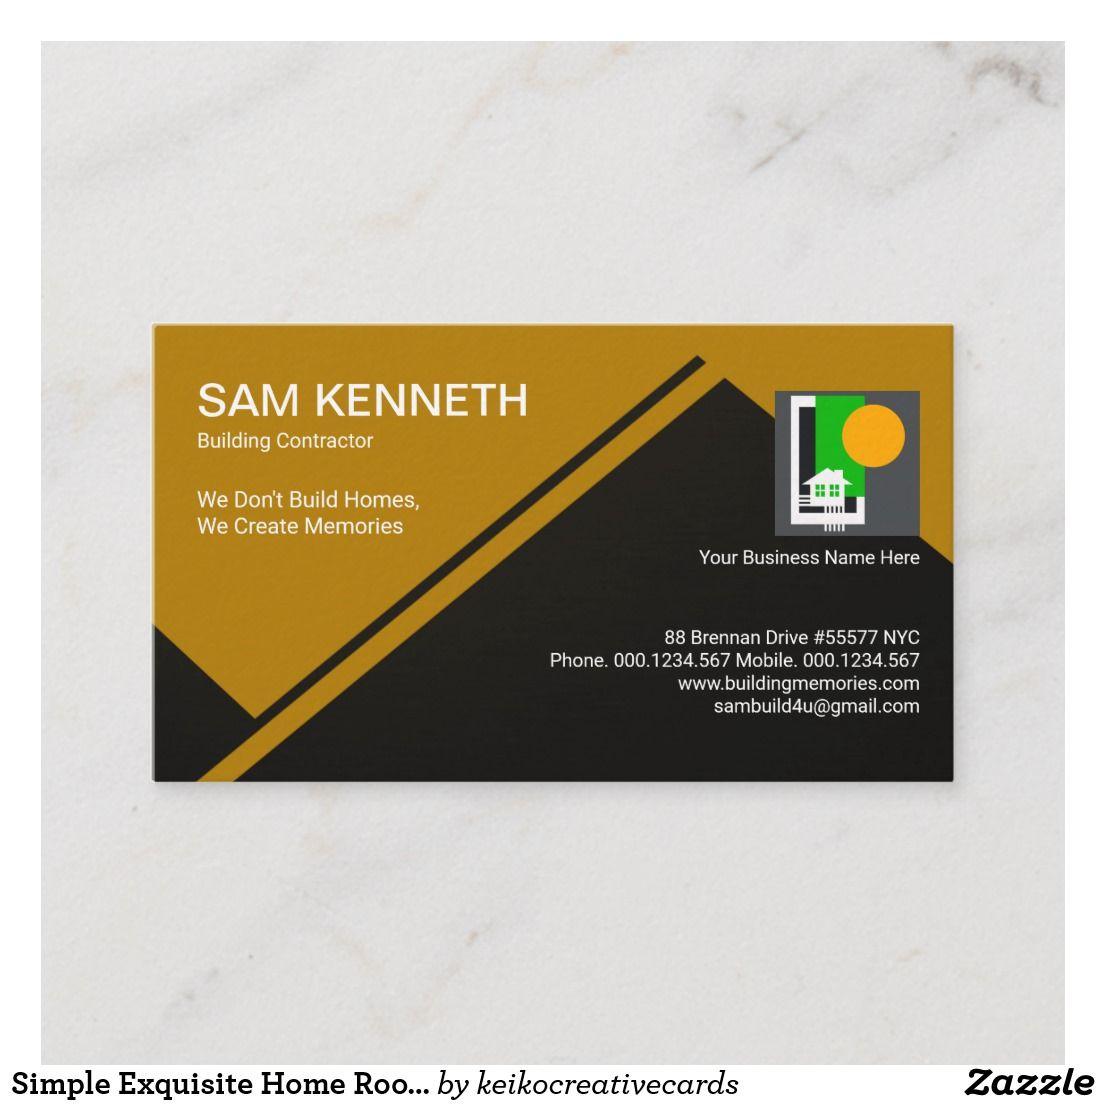 Simple Exquisite Home Roof Building Construction Business Card Zazzle Com Construction Business Cards Construction Business Building Construction